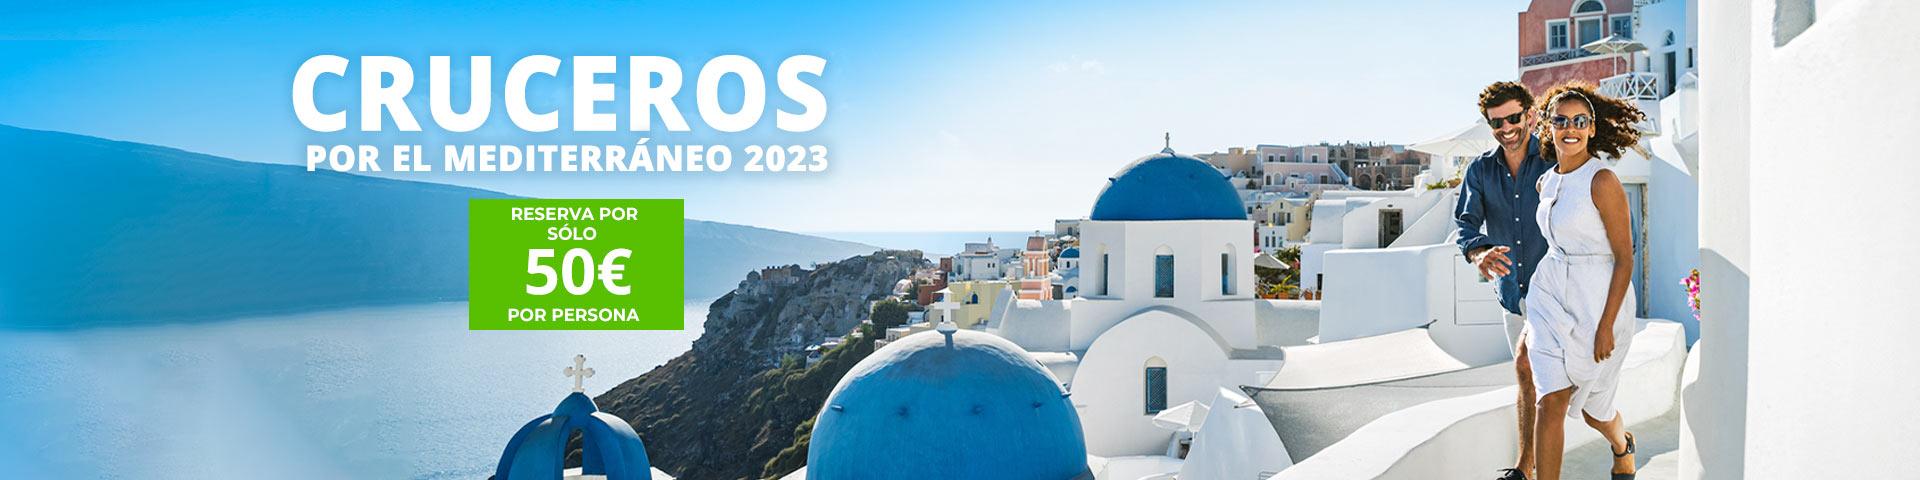 Cruceros Mediterráneo 2021. CrucerosMediterraneo.com